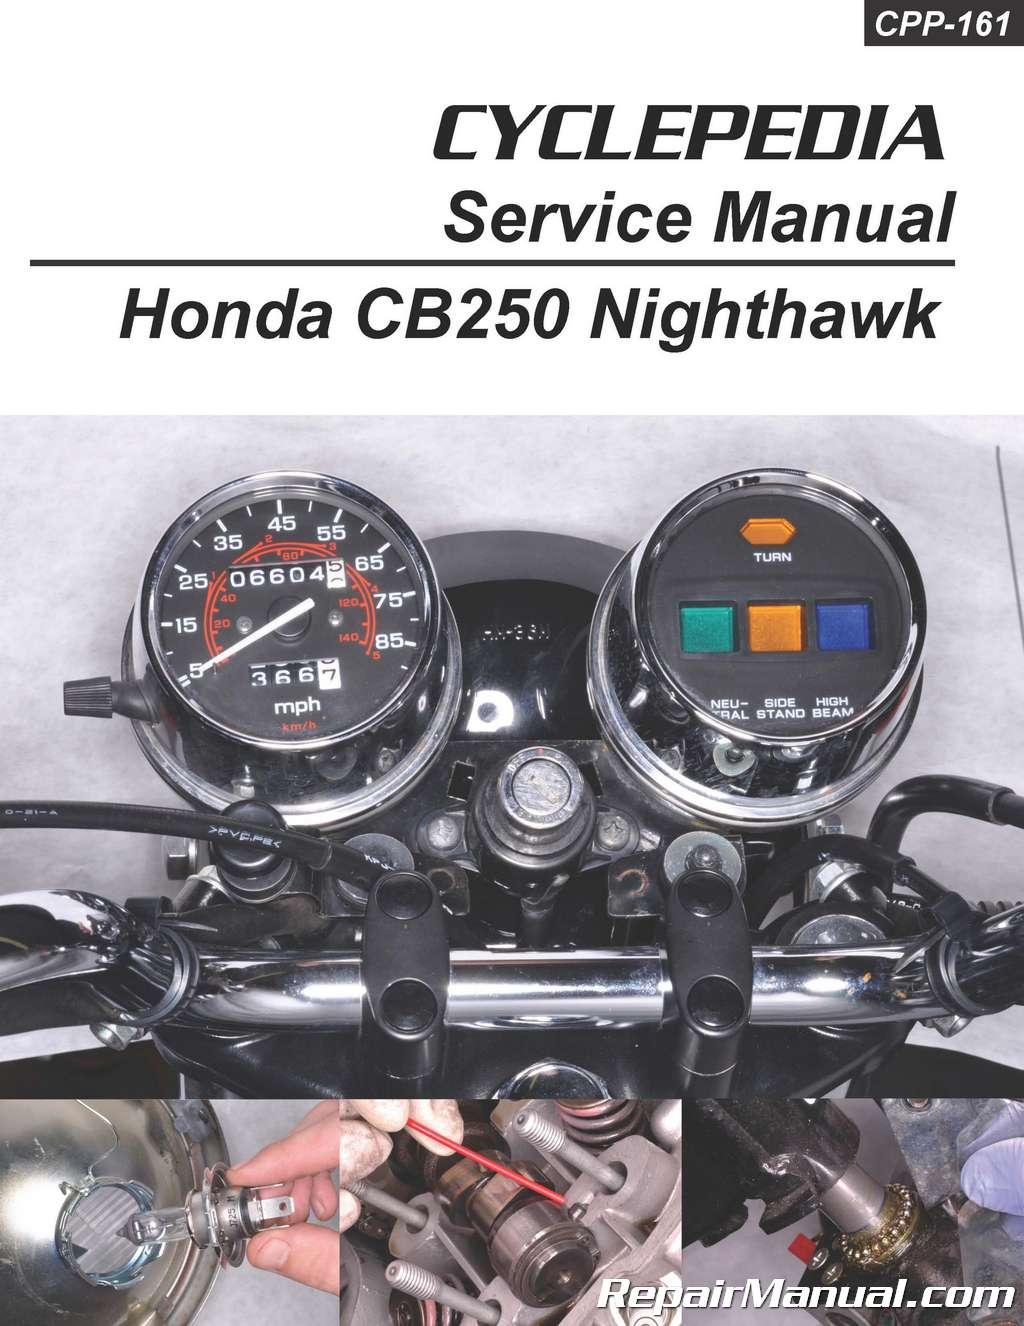 Honda CB250 Nighthawk Cyclepedia Printed Motorcycle Repair ManualRepair Manuals Online